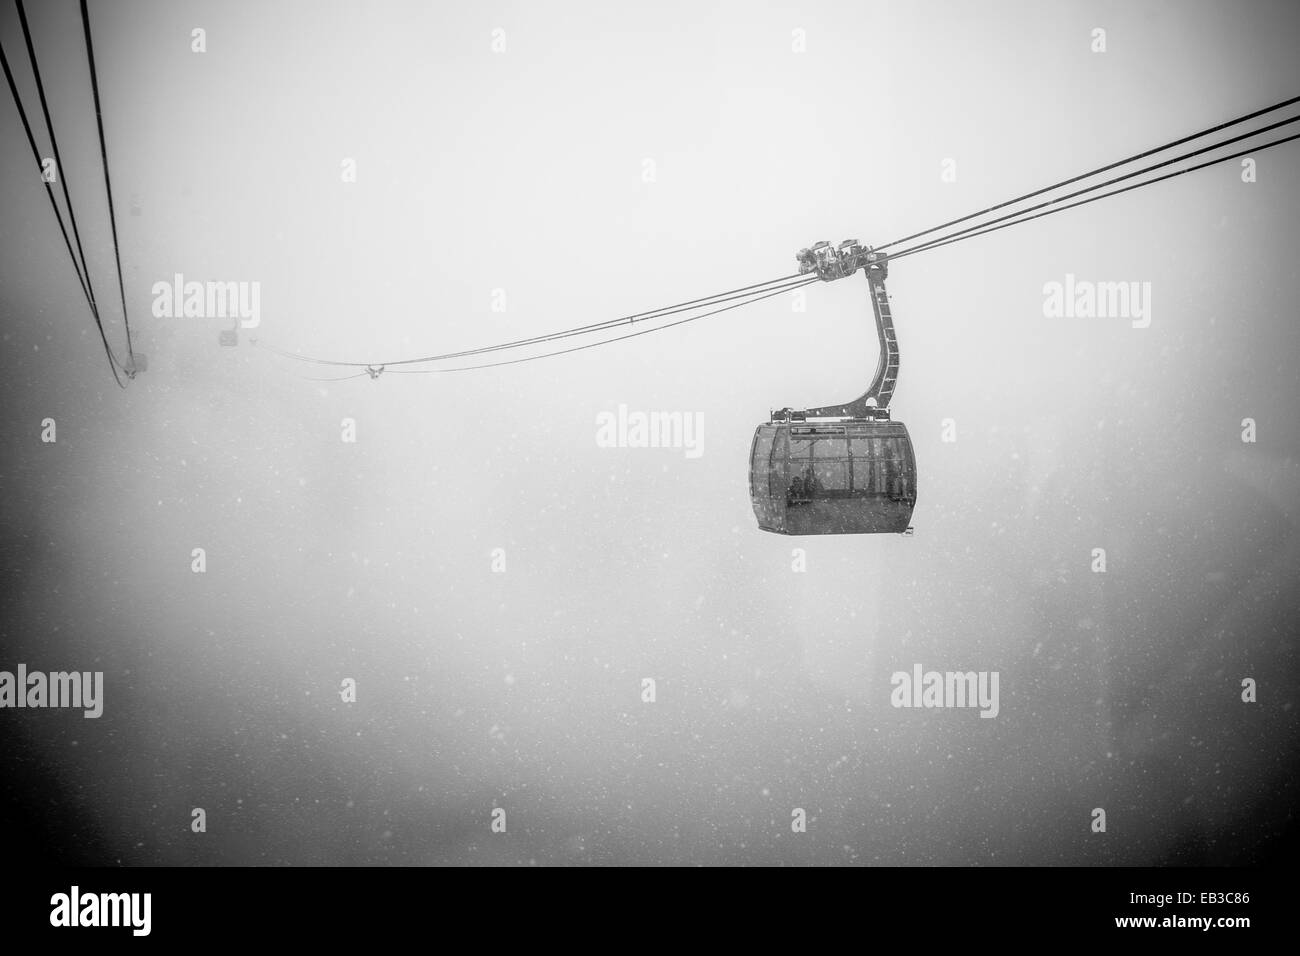 Canada, British Columbia, Gondola in heavy snow fall in Whistler - Stock Image